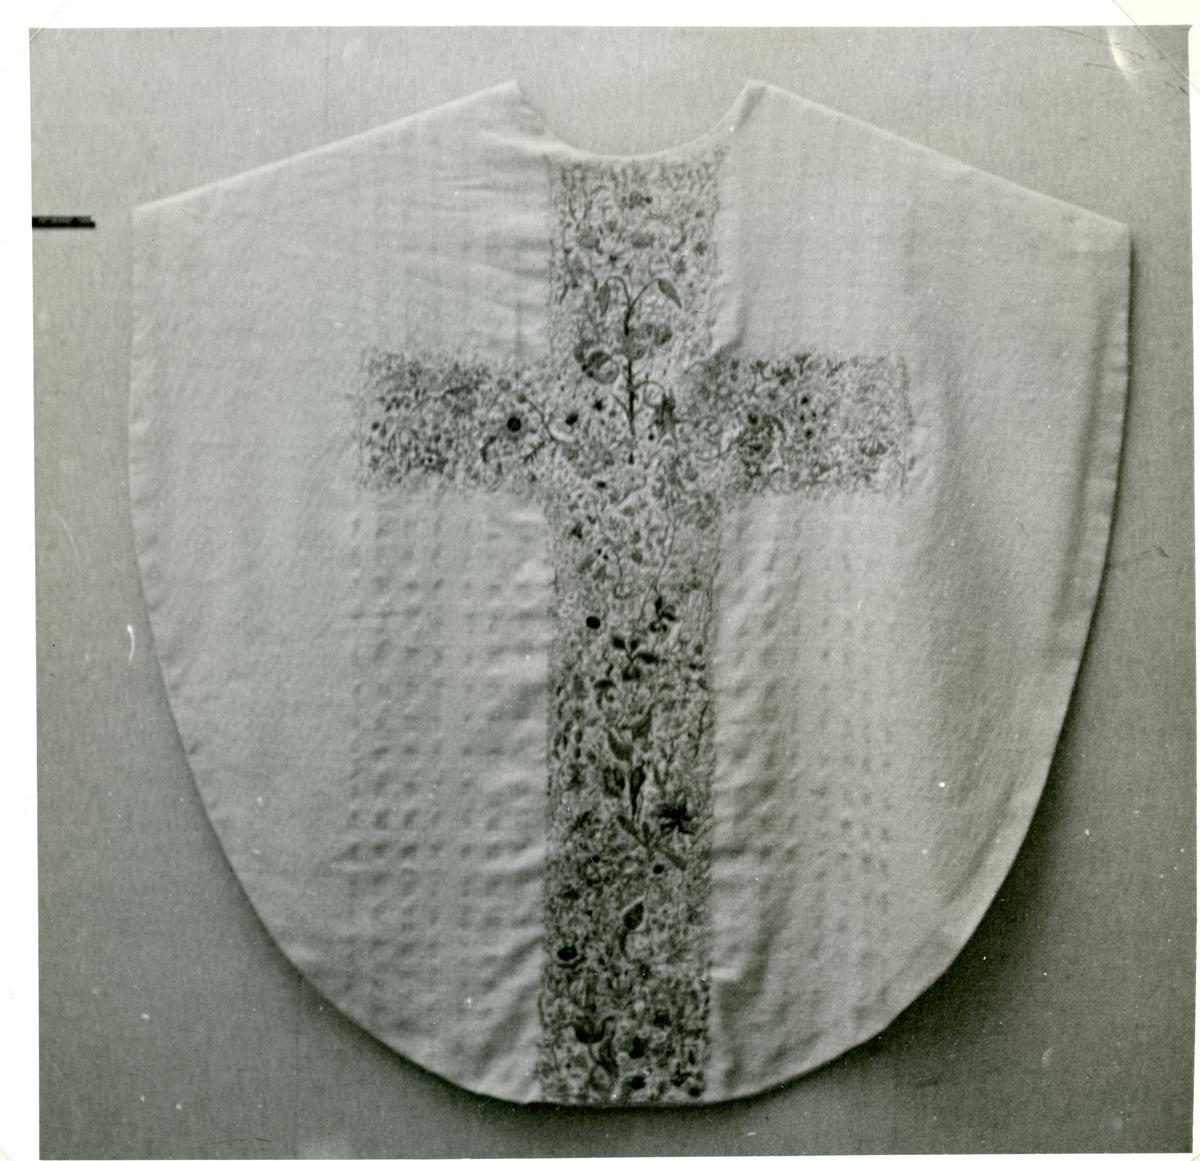 Kung Karl sn, Kungsör. Mässhake, Kung Karls kyrka, 1963.